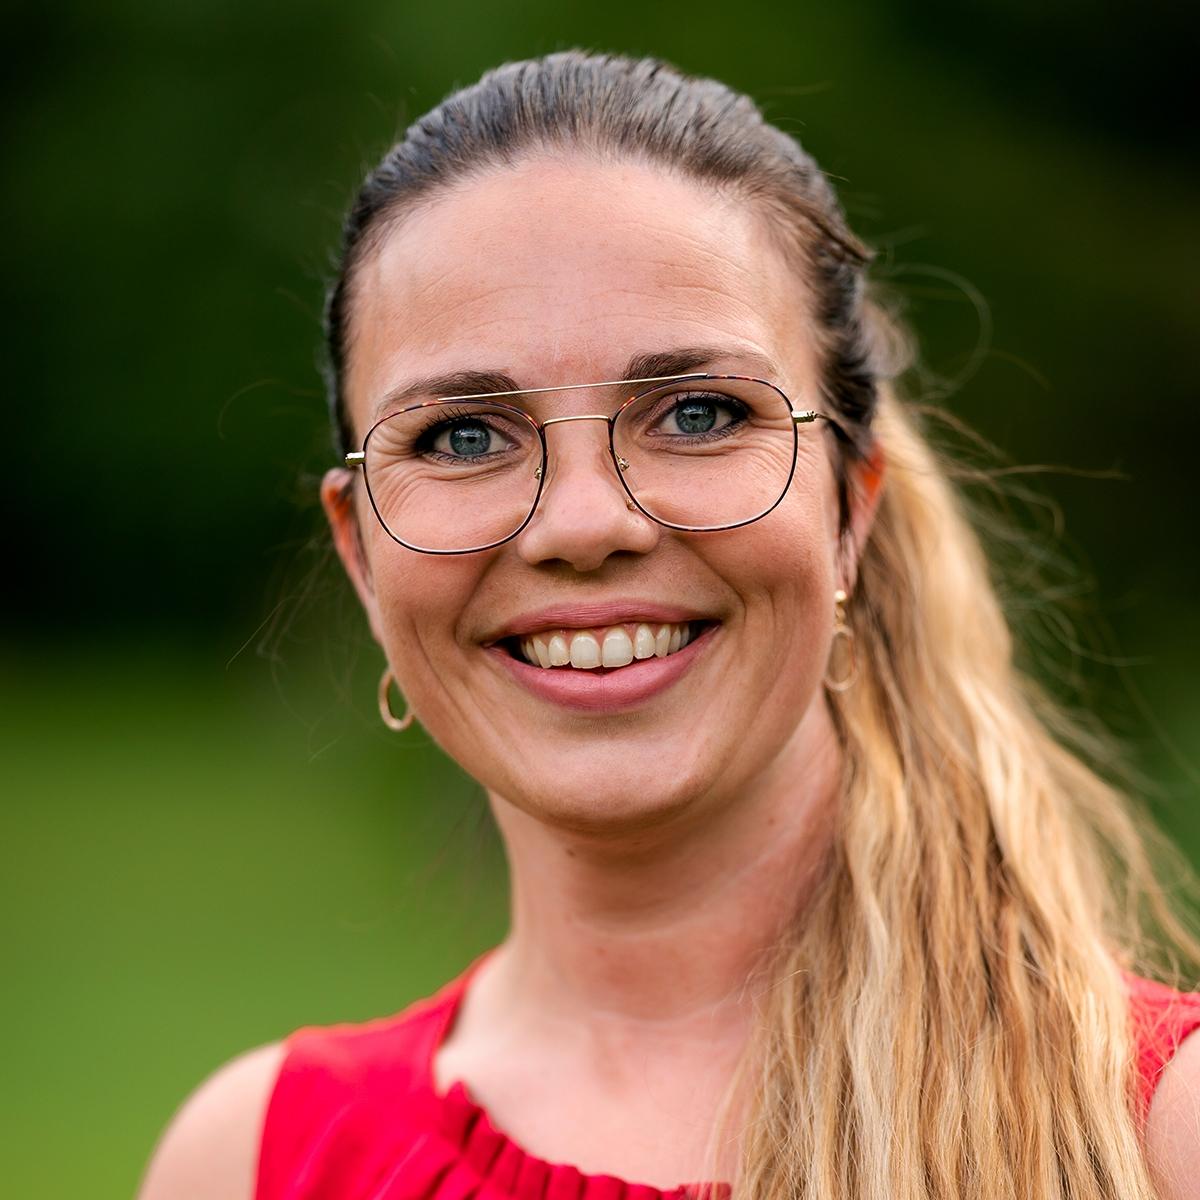 Beate Stavdal Riise SoMe-ansvarlig i B2B ARENA AS